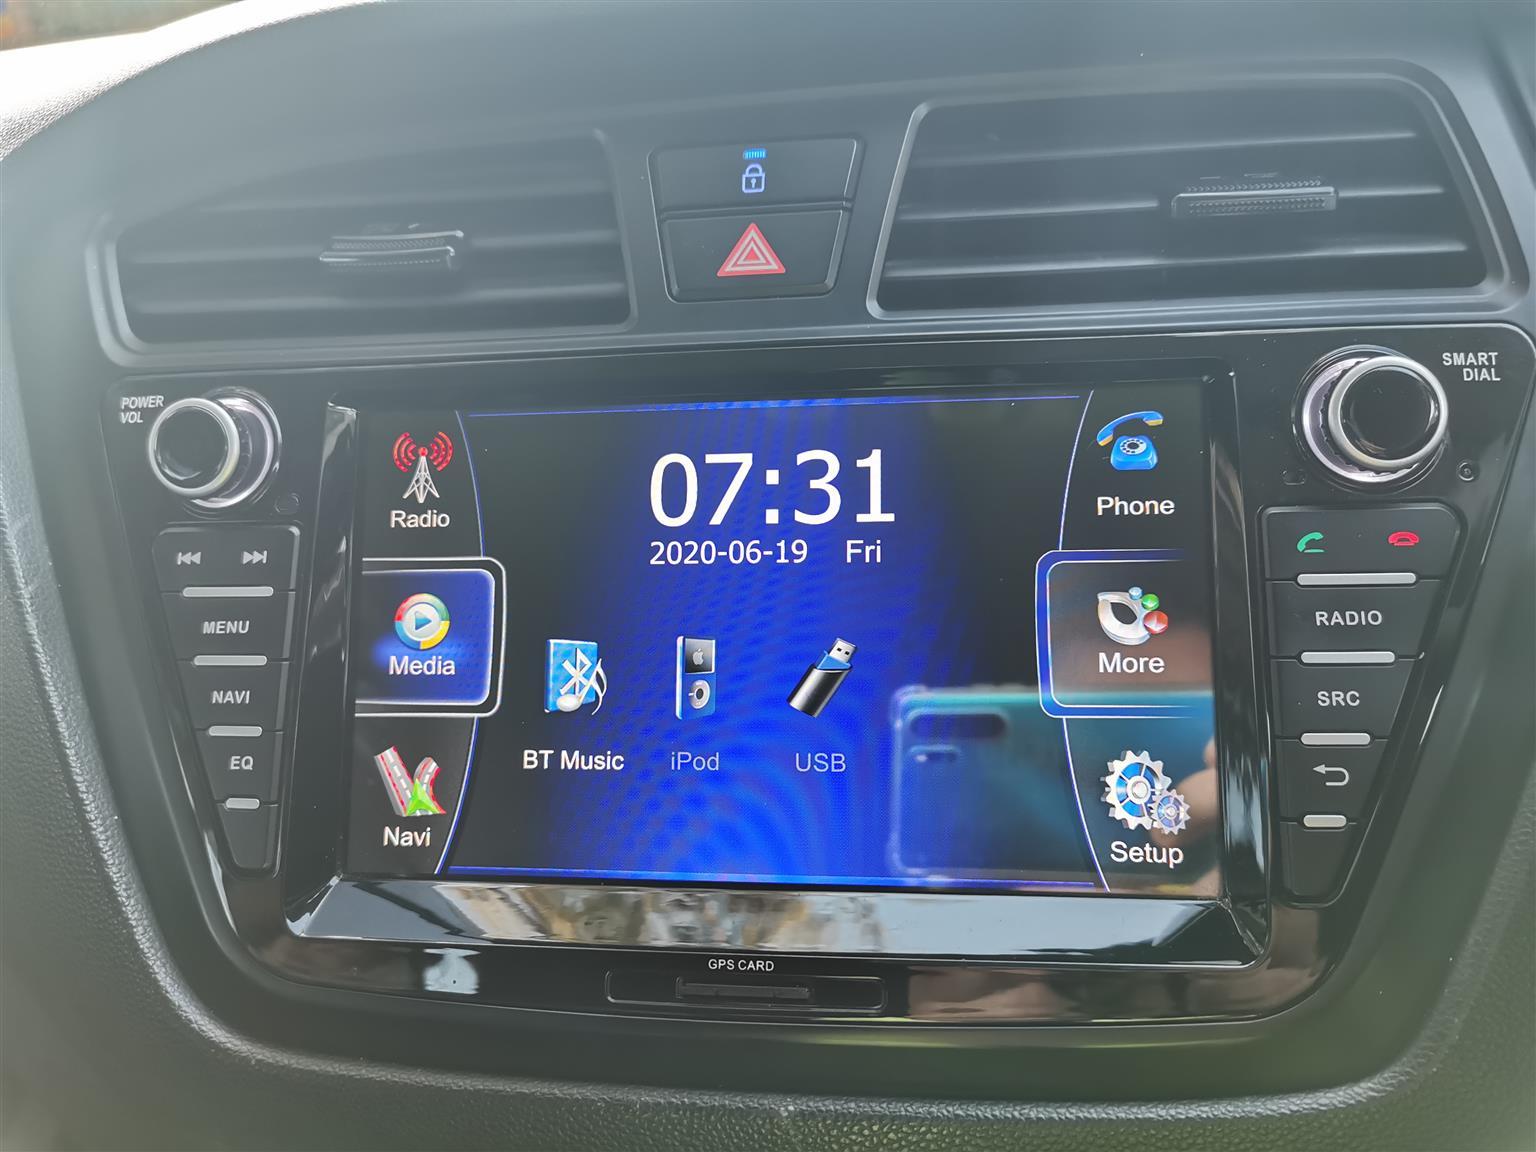 Hyundai i20 Infotainment Satnav Radio